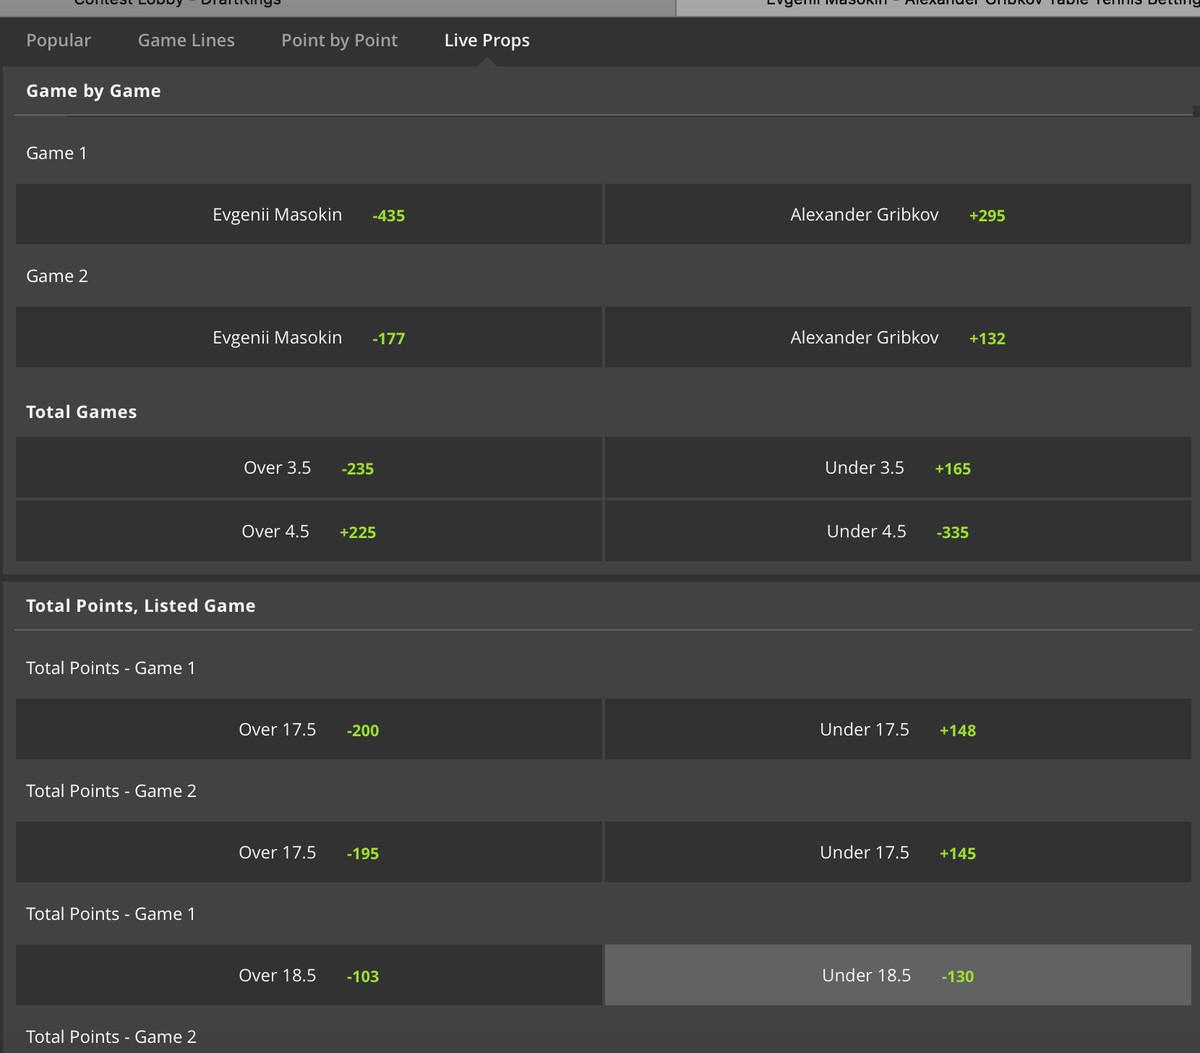 best spread betting sites ukraine